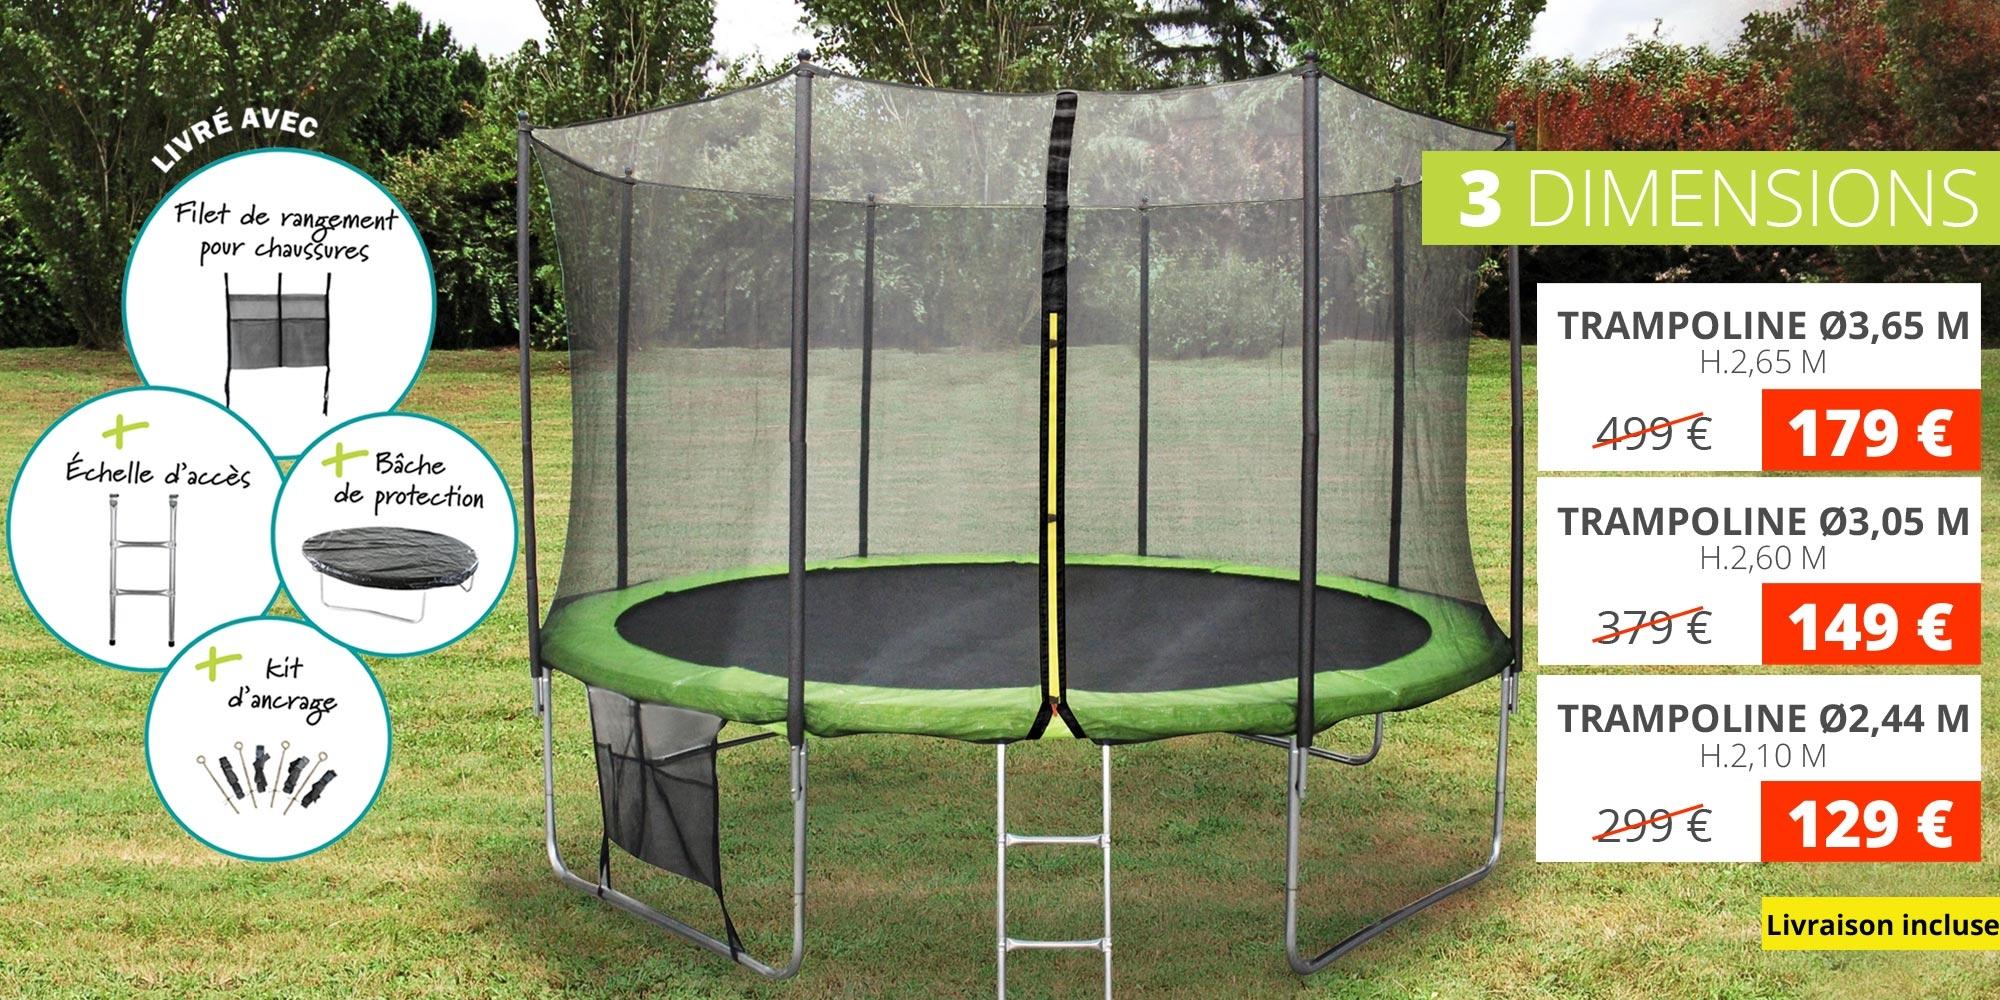 SOLDES Trampolines de jardin pour enfants , trampoline en solde